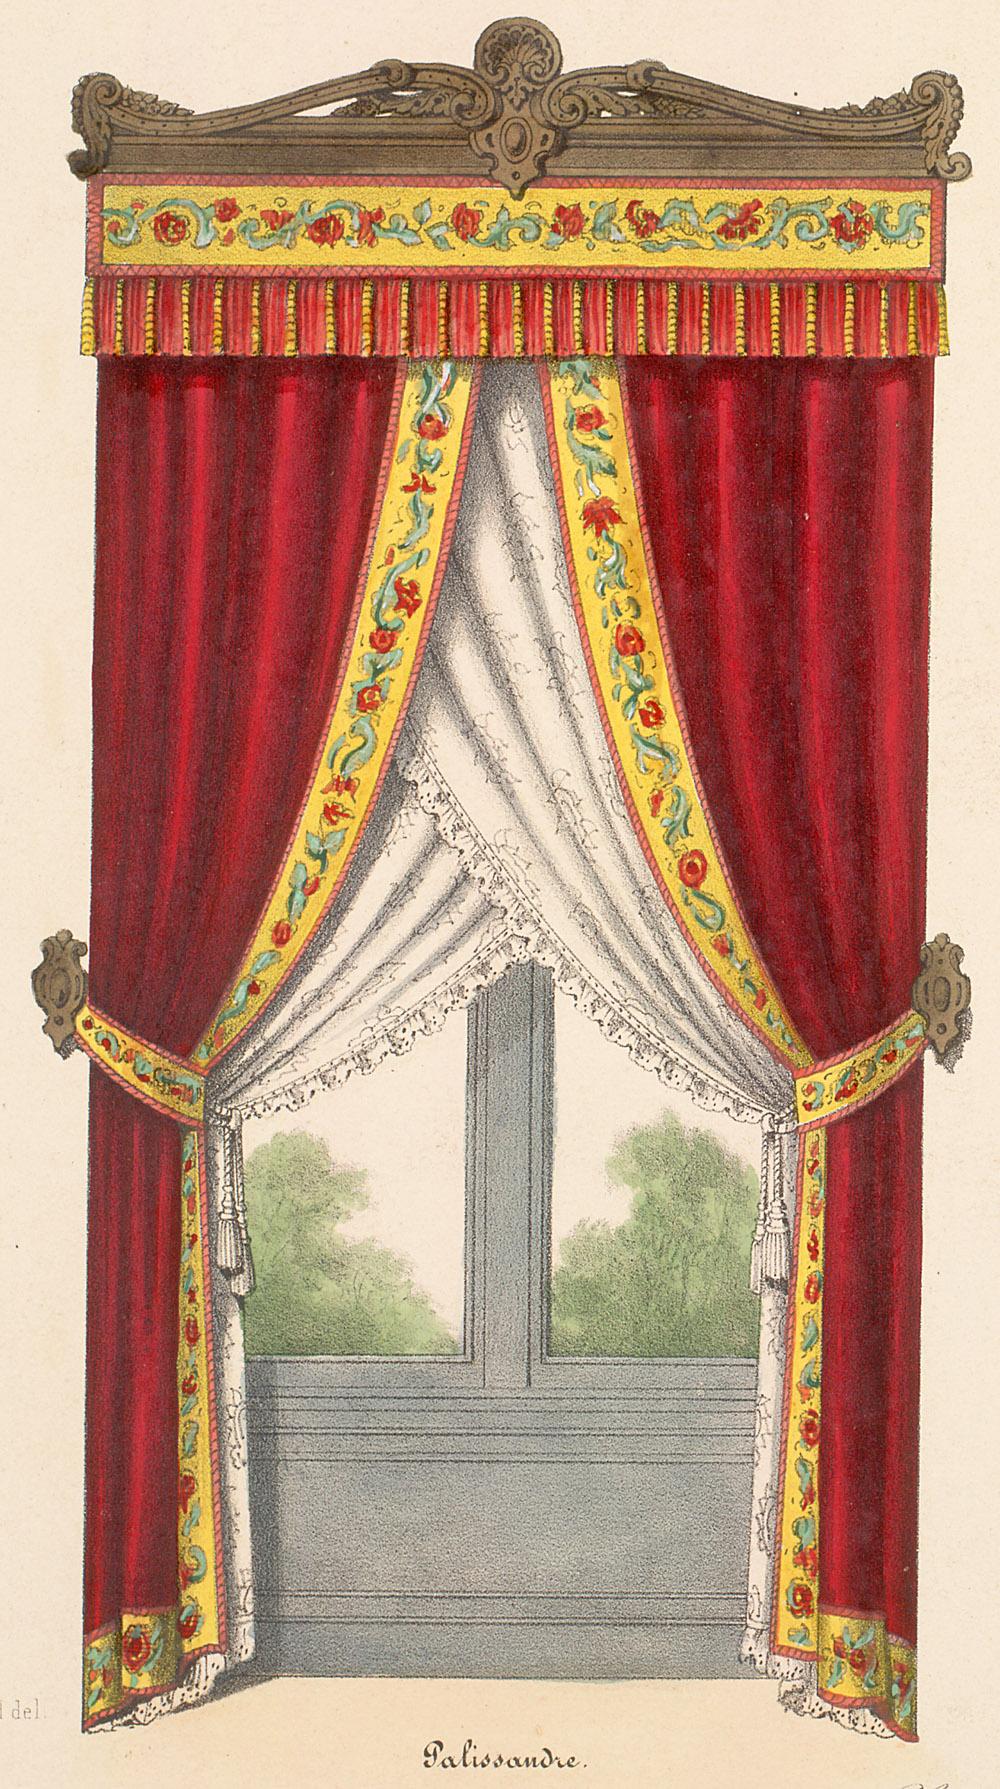 Window Treatment,  Image number:SIL12-2-108b